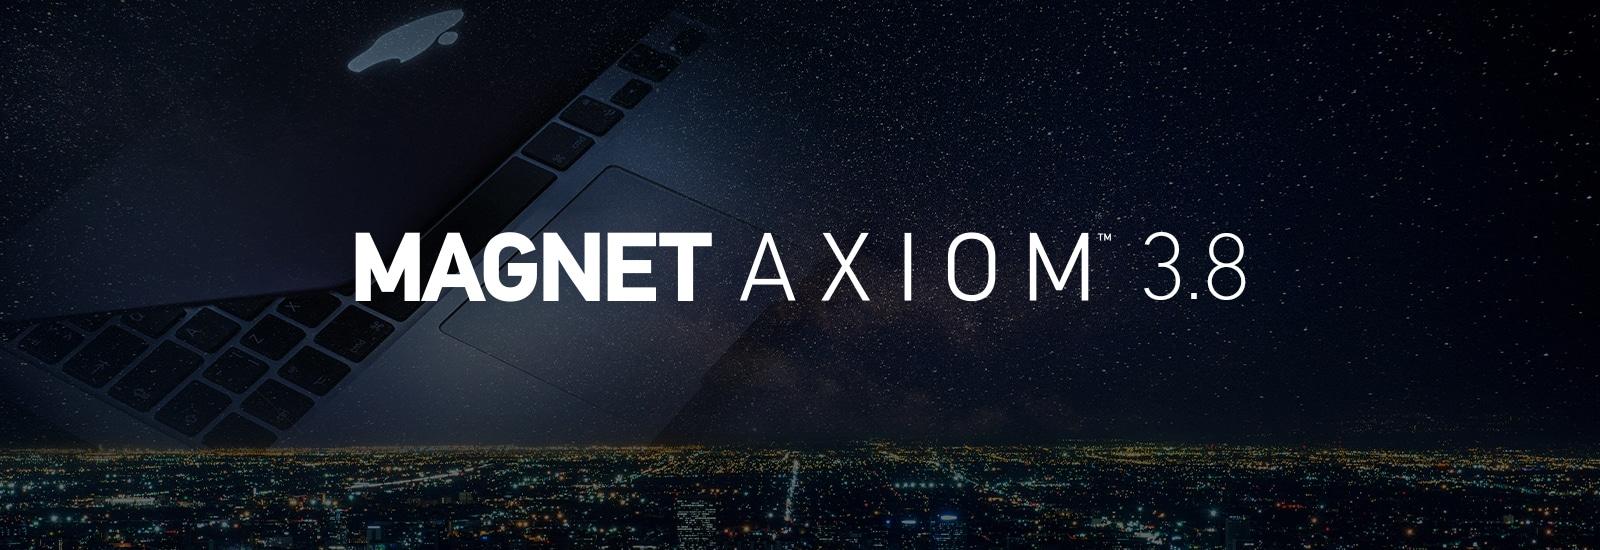 Magnet AXIOM 3.8